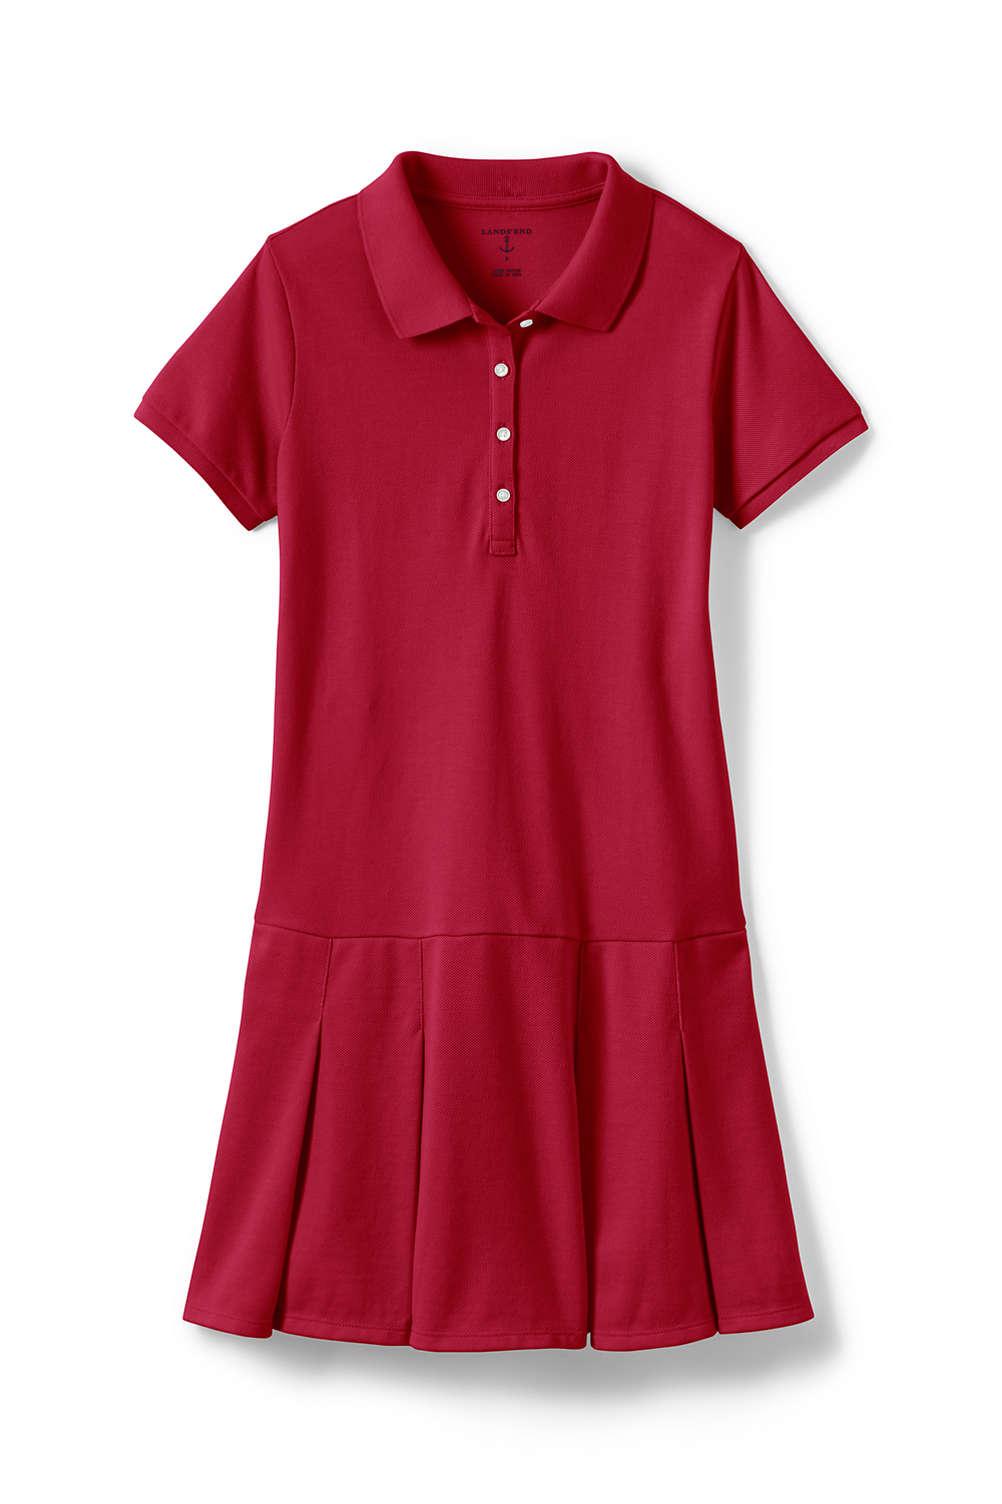 fa1f8b3f54ce School Uniform Girls Short Sleeve Mesh Polo Dress from Lands' End